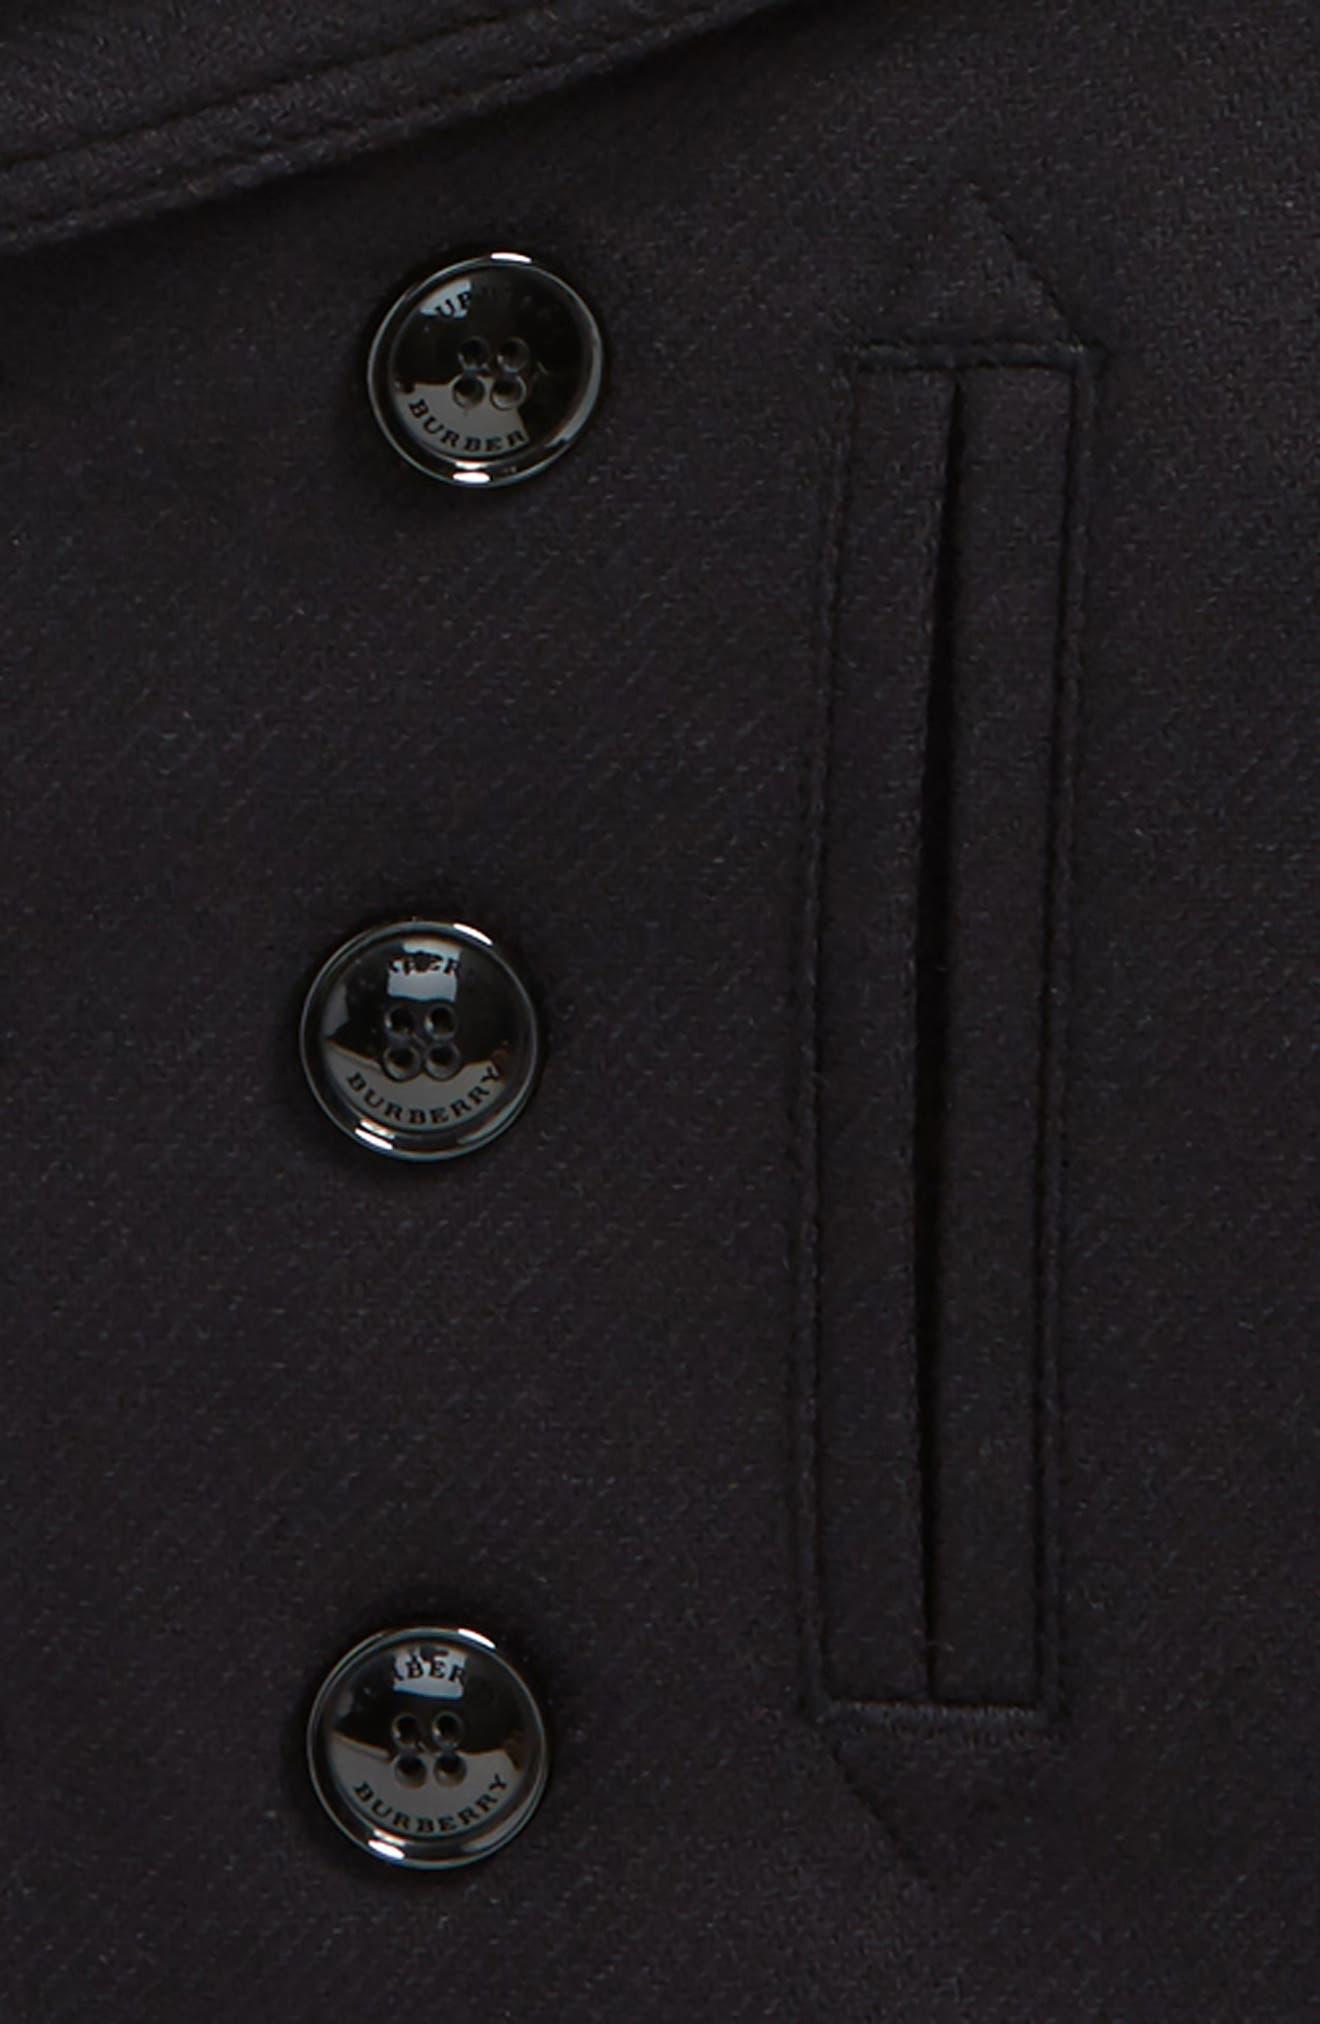 Pat 2-in-1 Vest & Peacoat,                             Alternate thumbnail 2, color,                             Navy